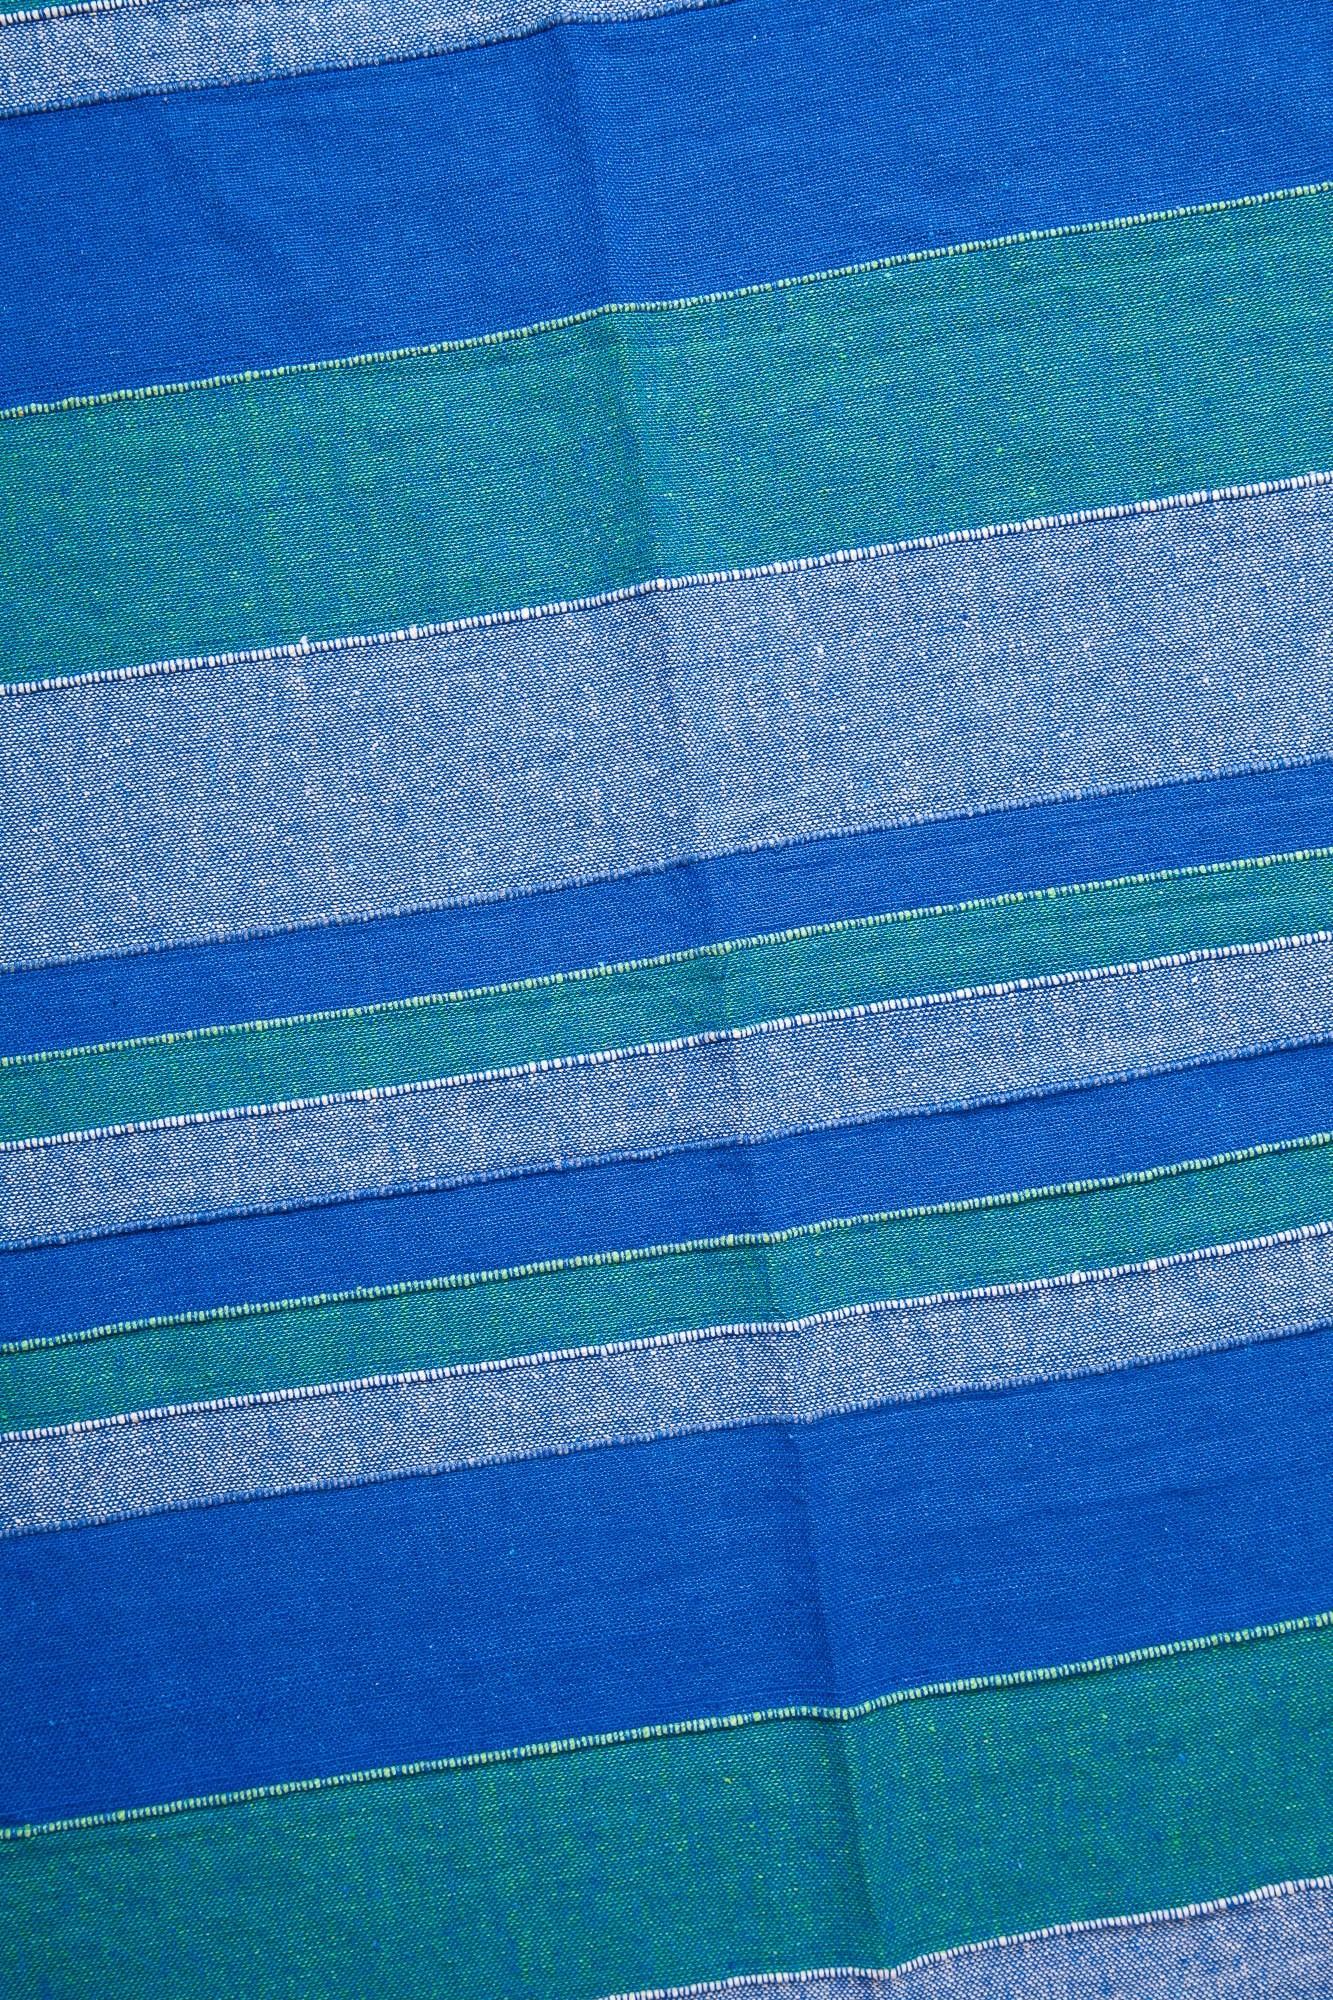 Cuvertura albastra in dungi-dubla